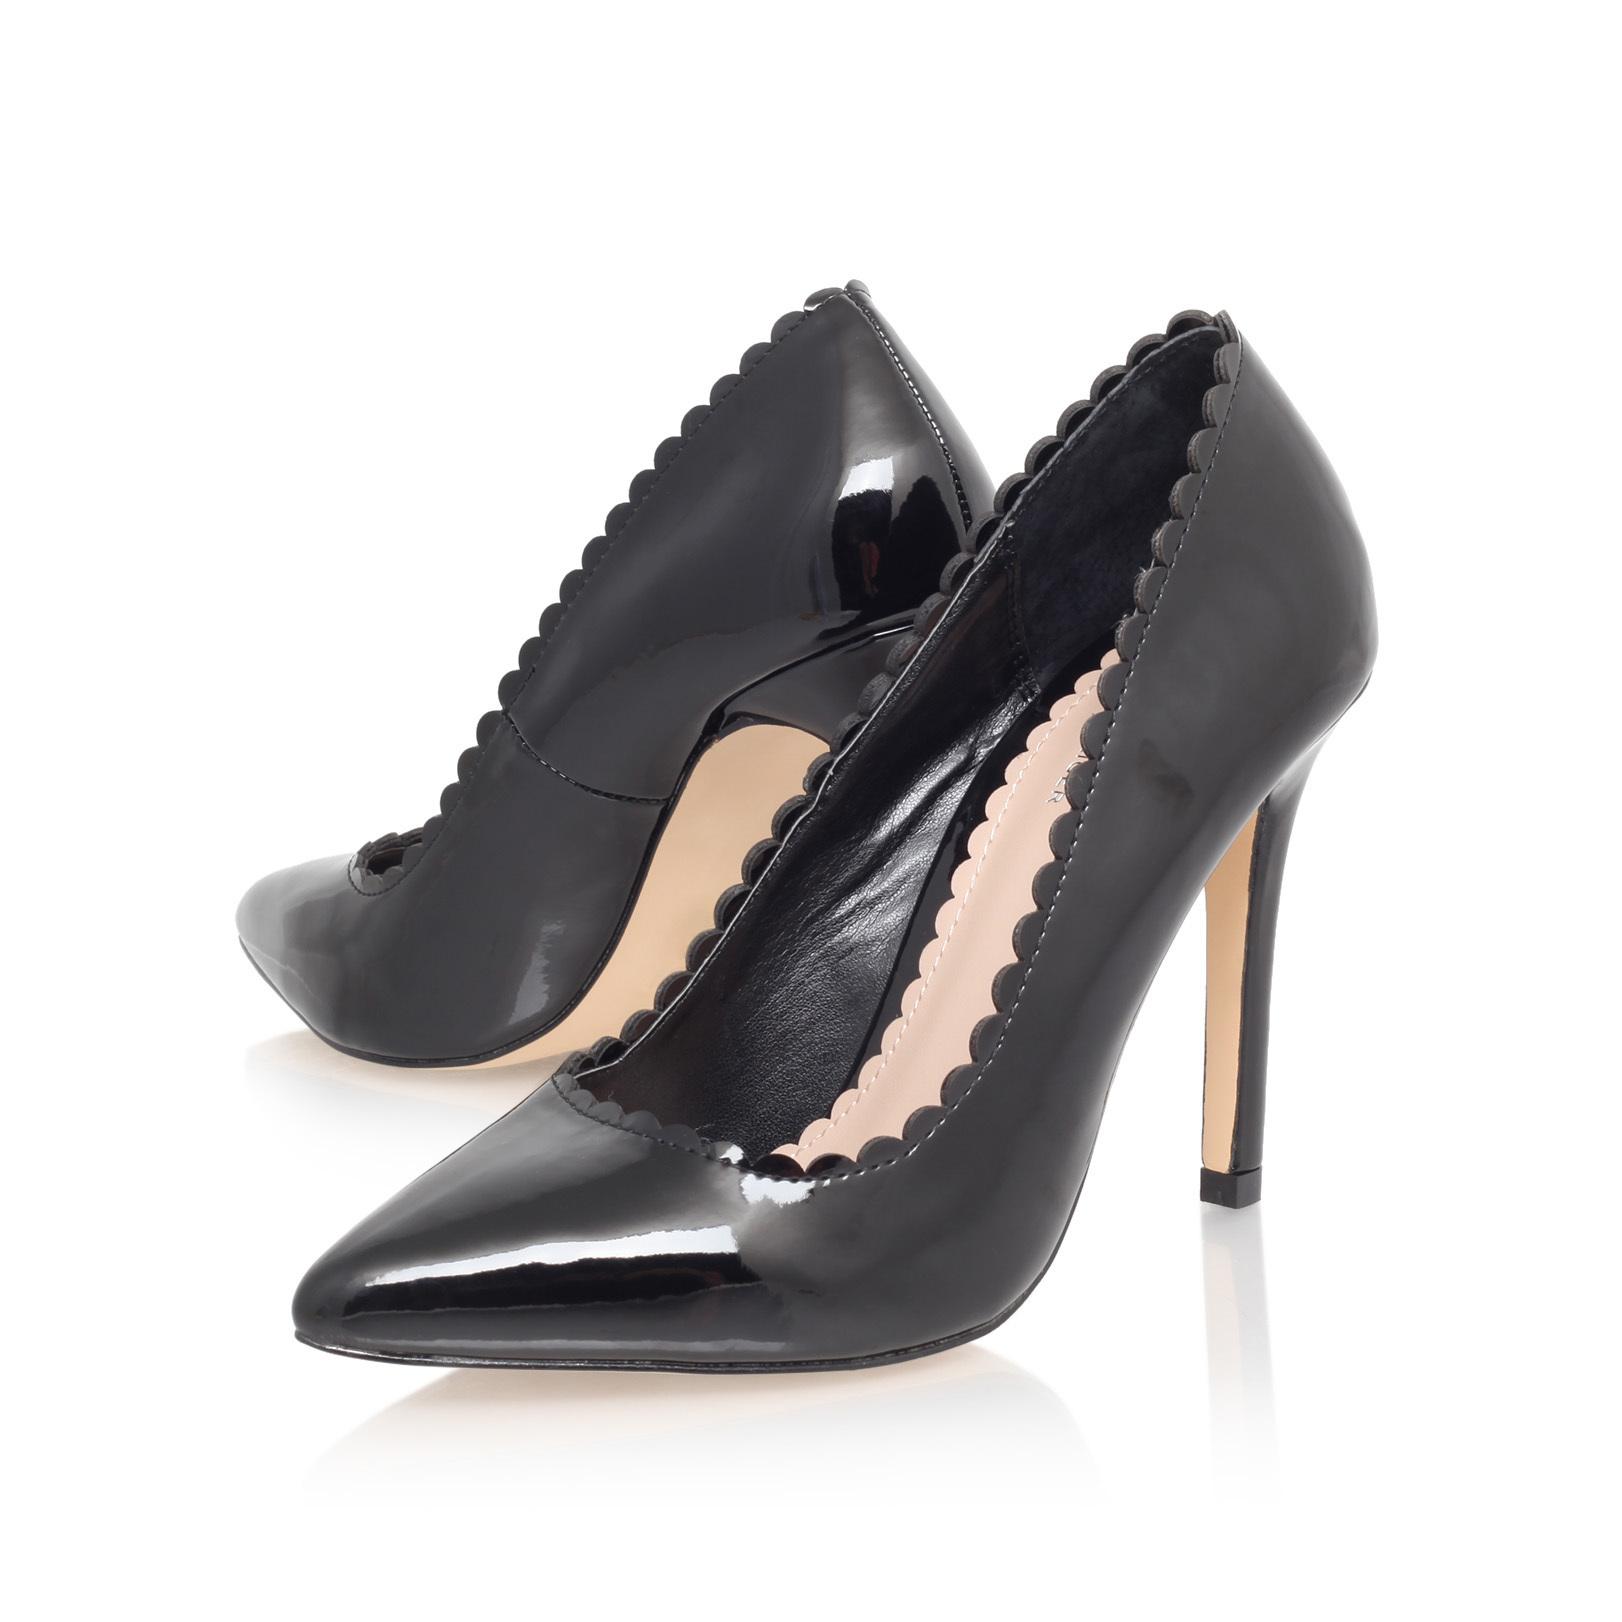 ea308a4d39 KASSANDRA Carvela Kassandra Black Patent Mid Heel Court Shoes by CARVELA